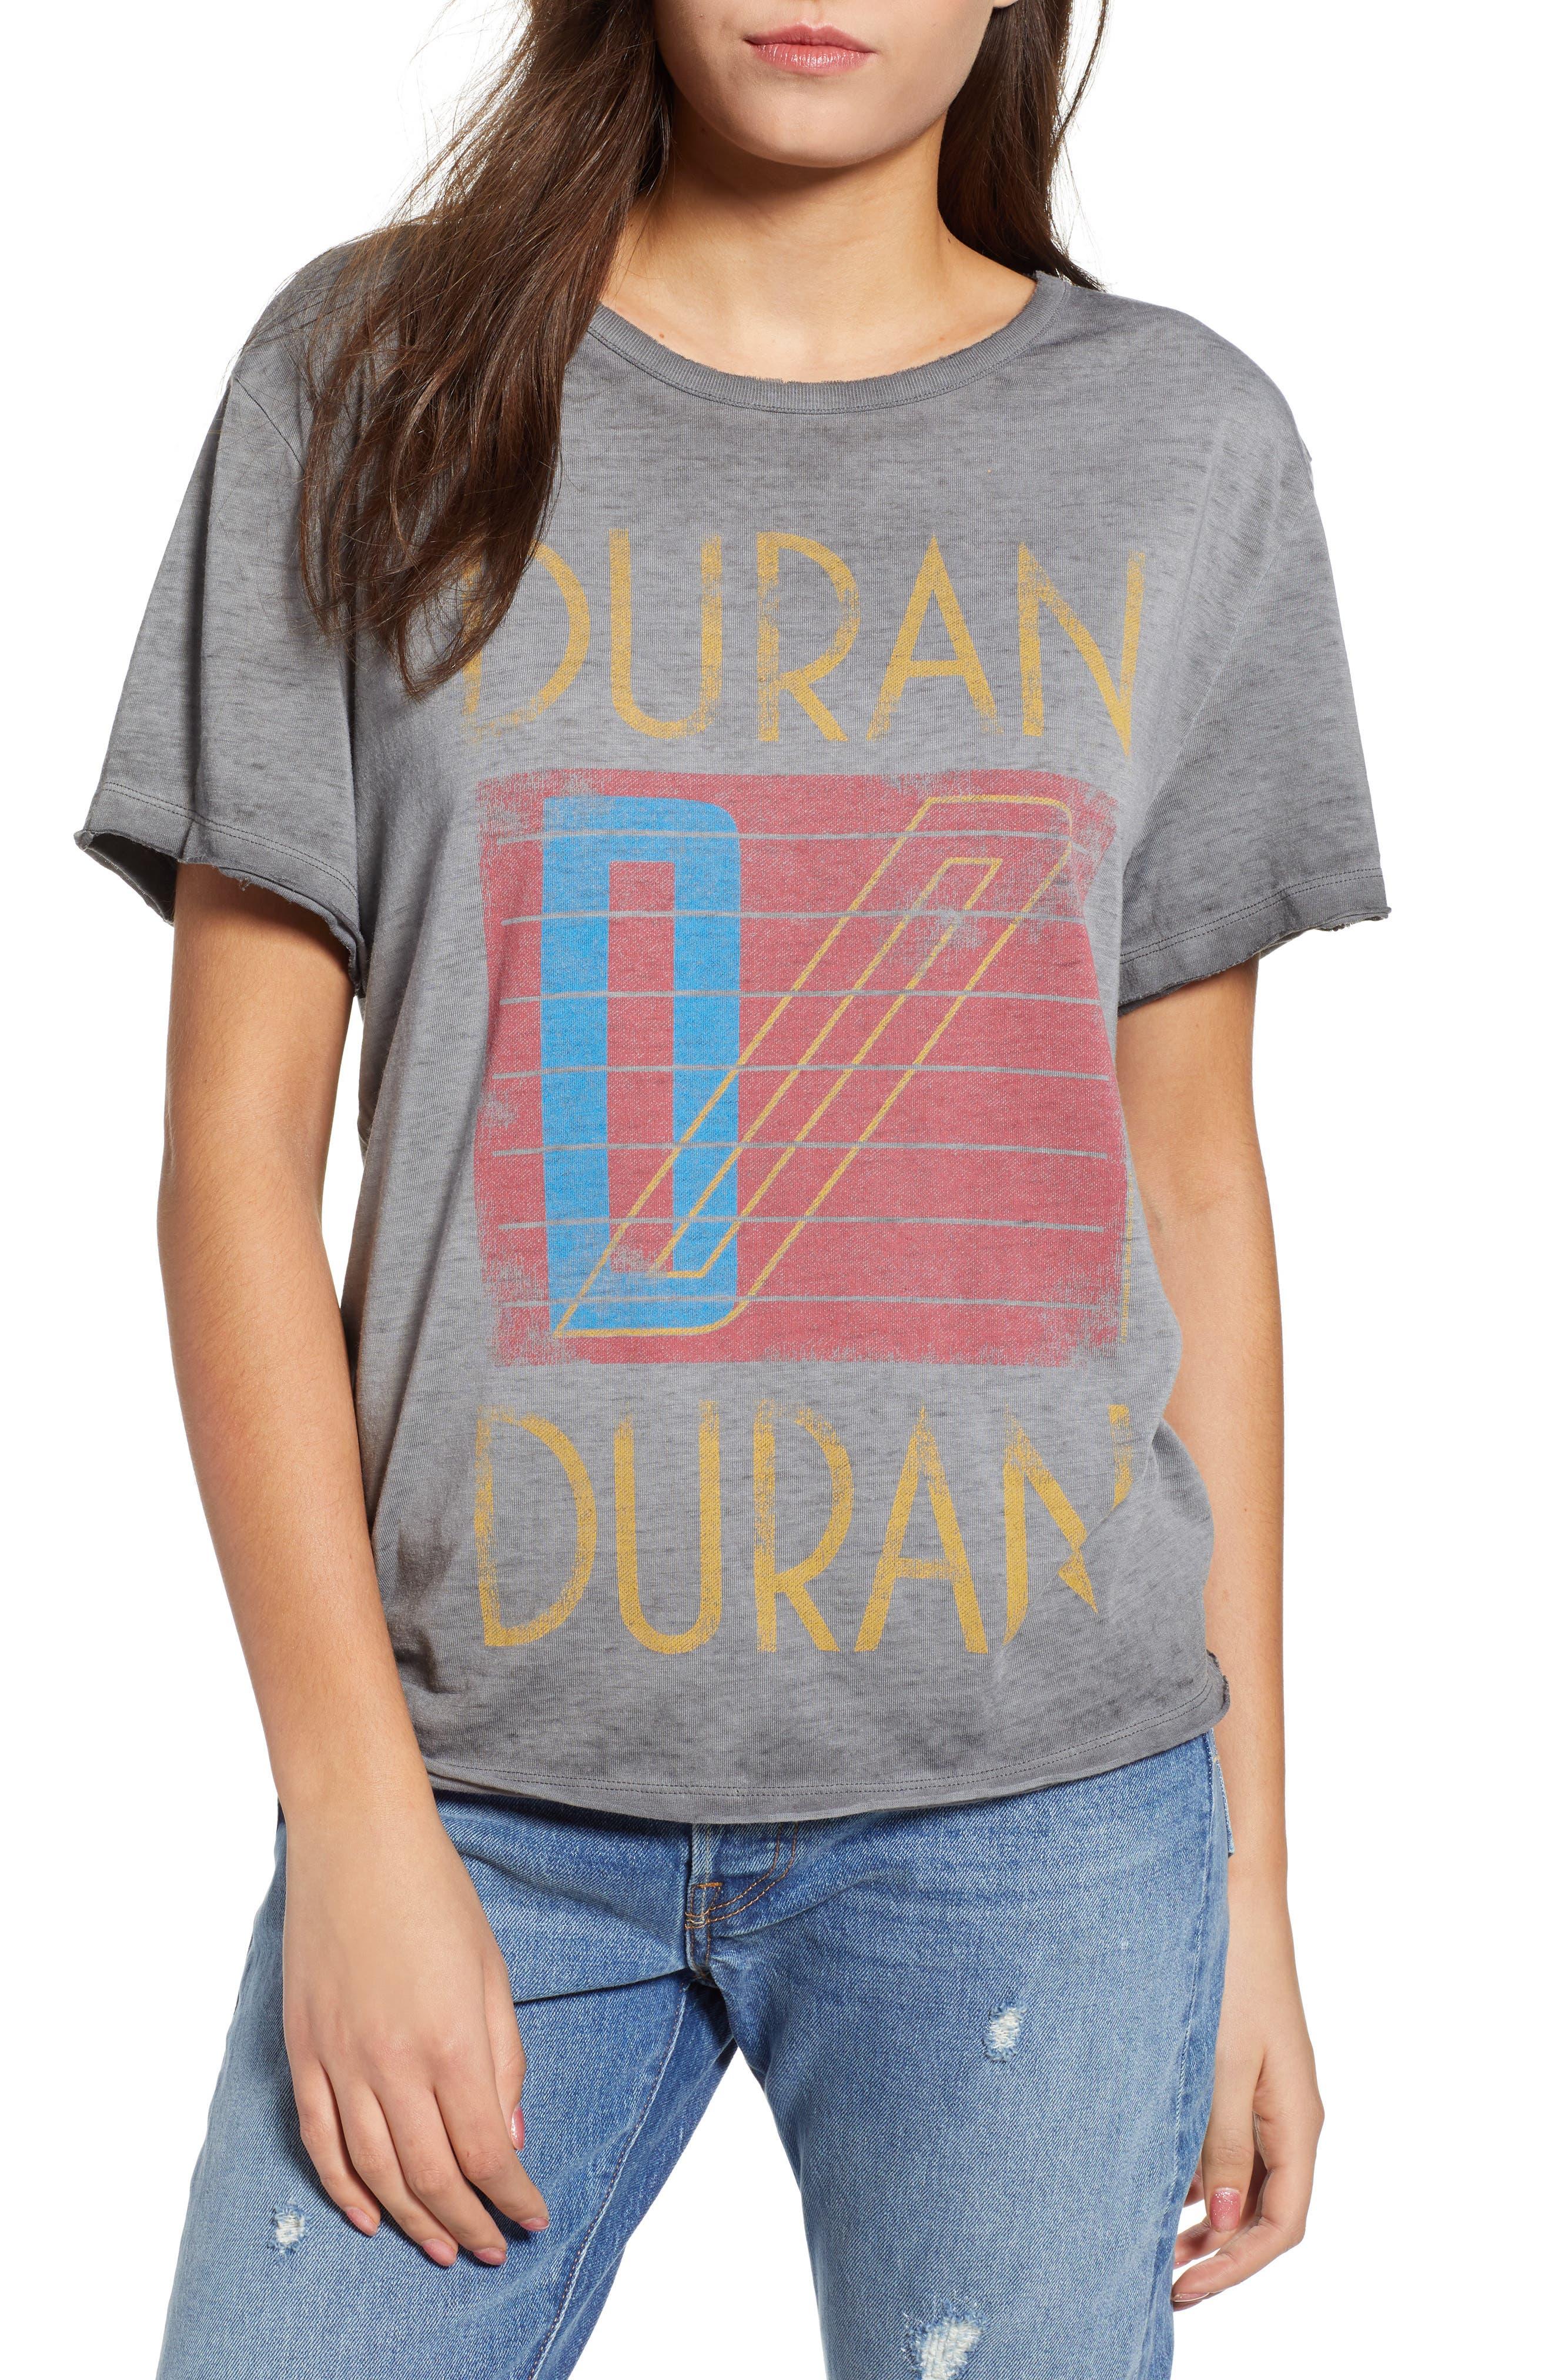 Duran Duran Tee,                         Main,                         color, GREY